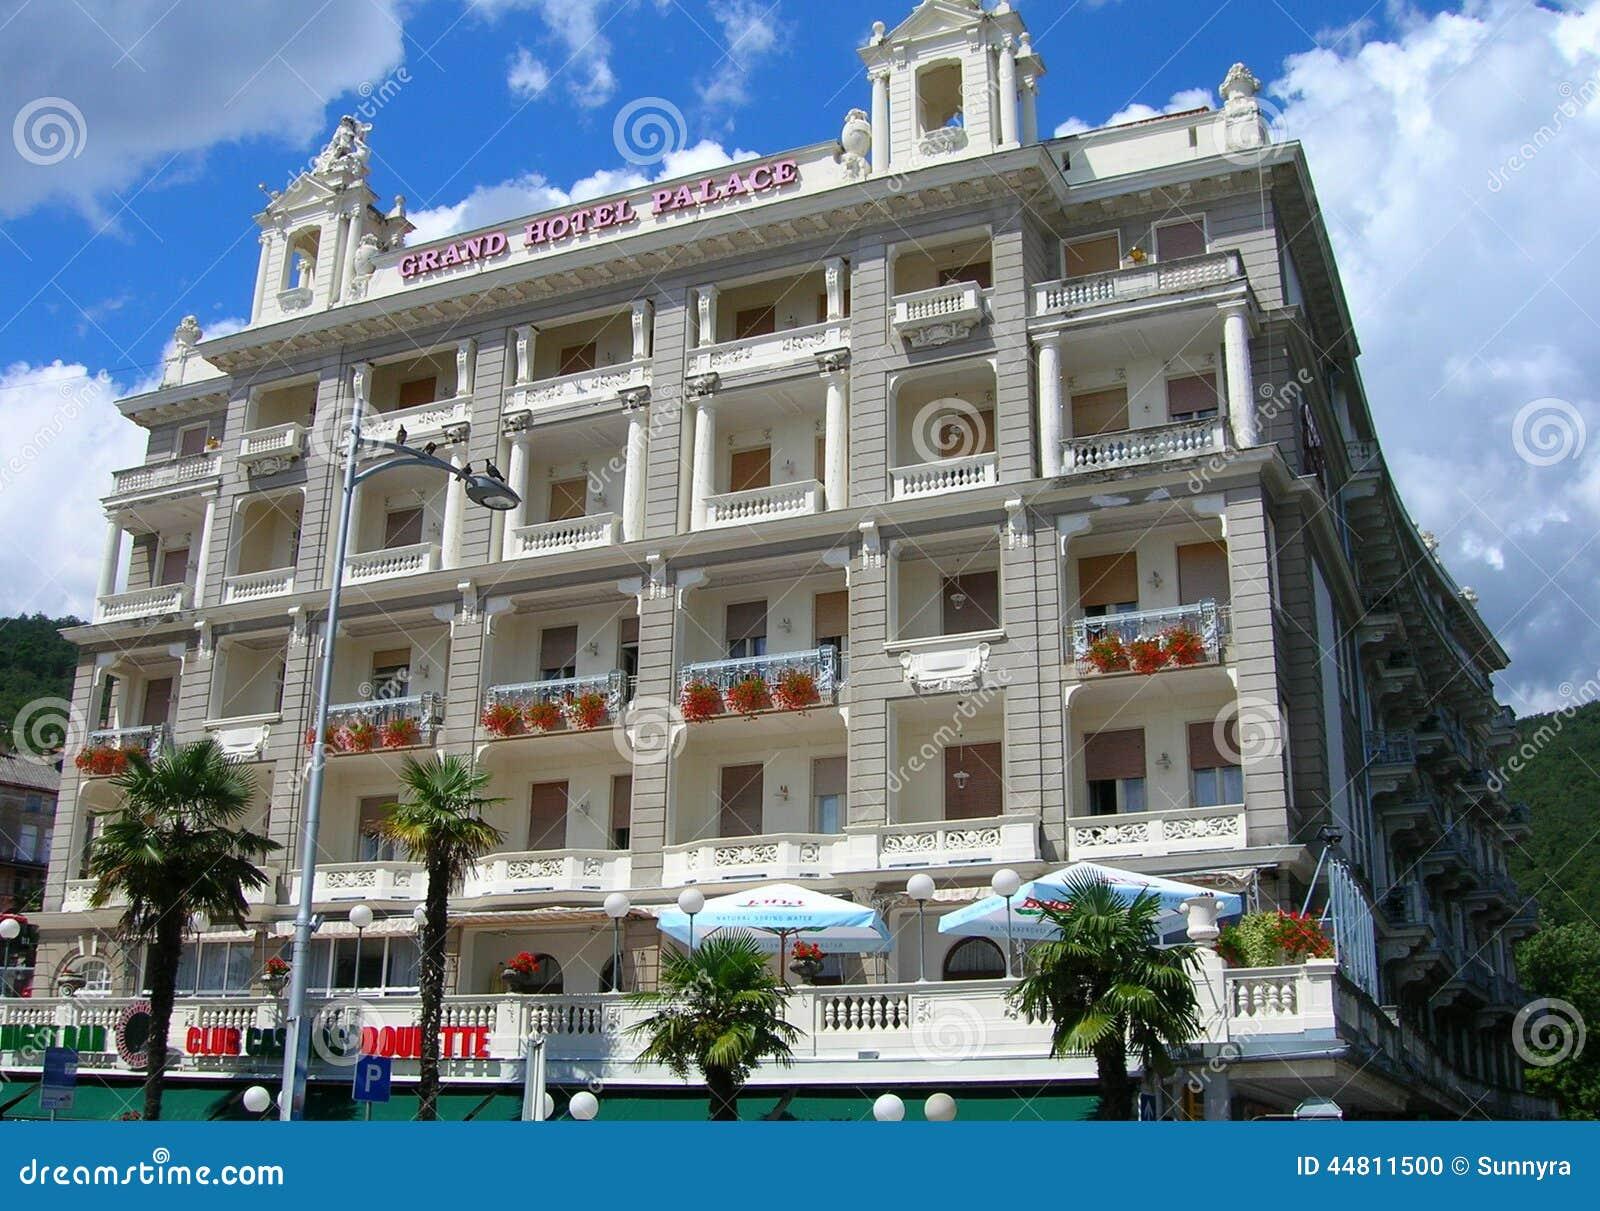 Hotel in opatija croatia editorial image image 44811500 for Design hotel opatija croatia